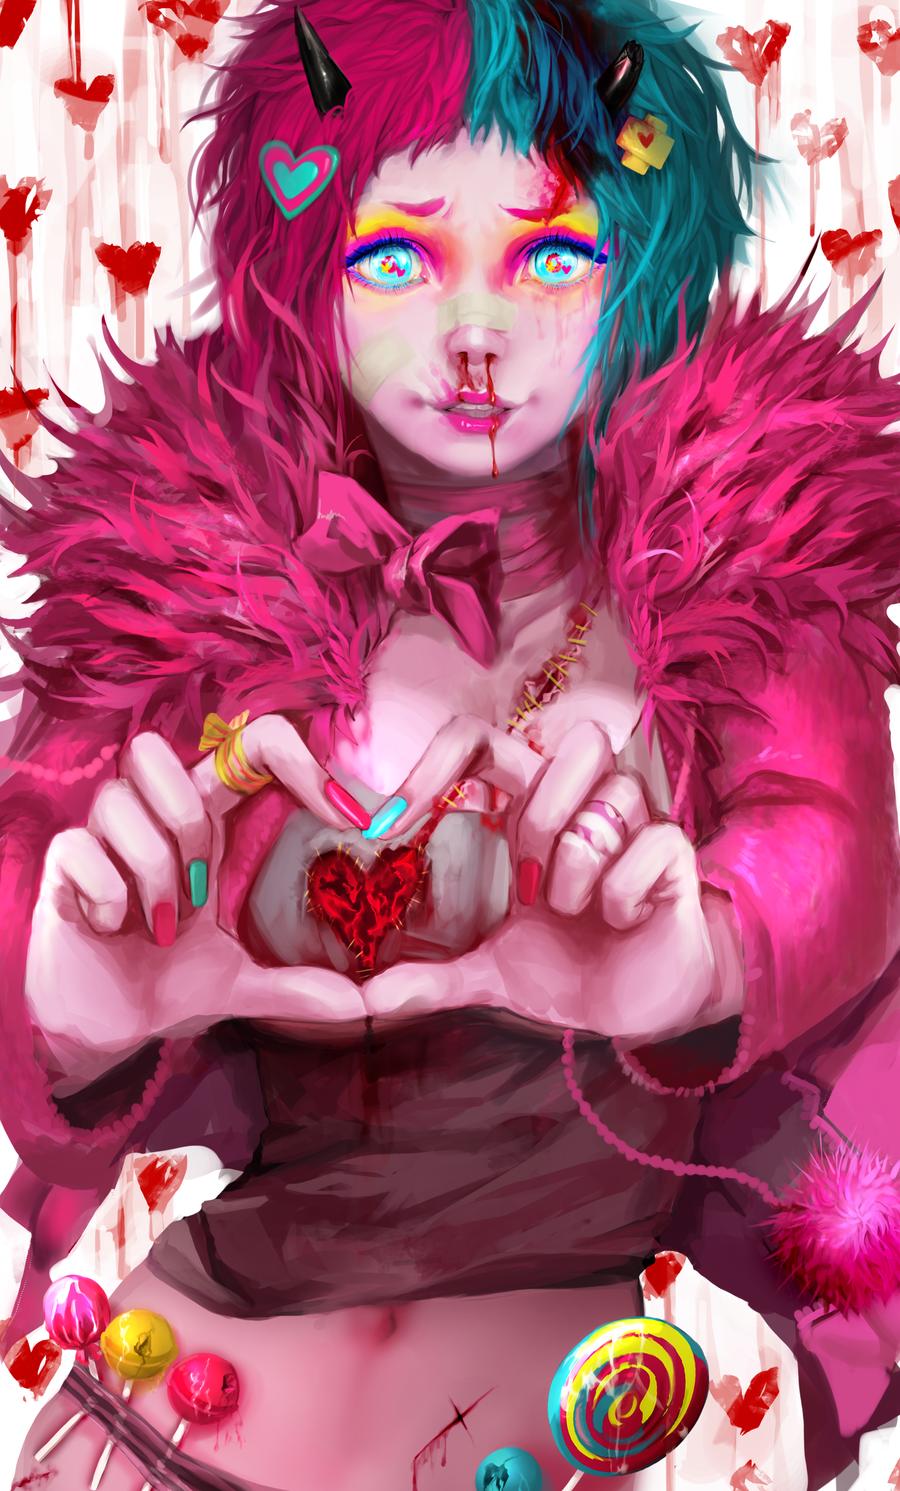 Anemia by genki-de